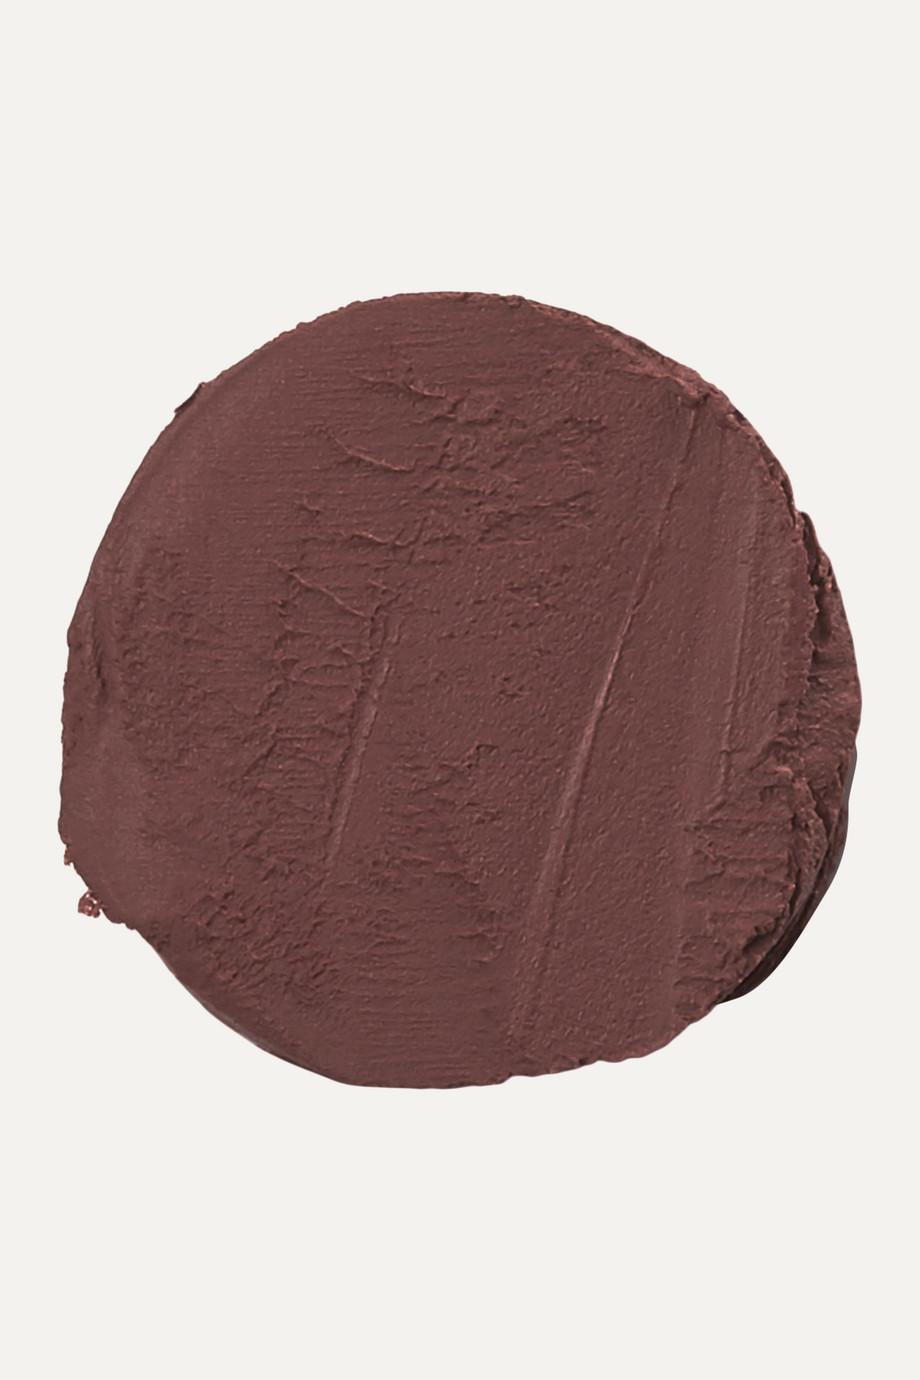 Huda Beauty Power Bullet Matte Lipstick - Game Night